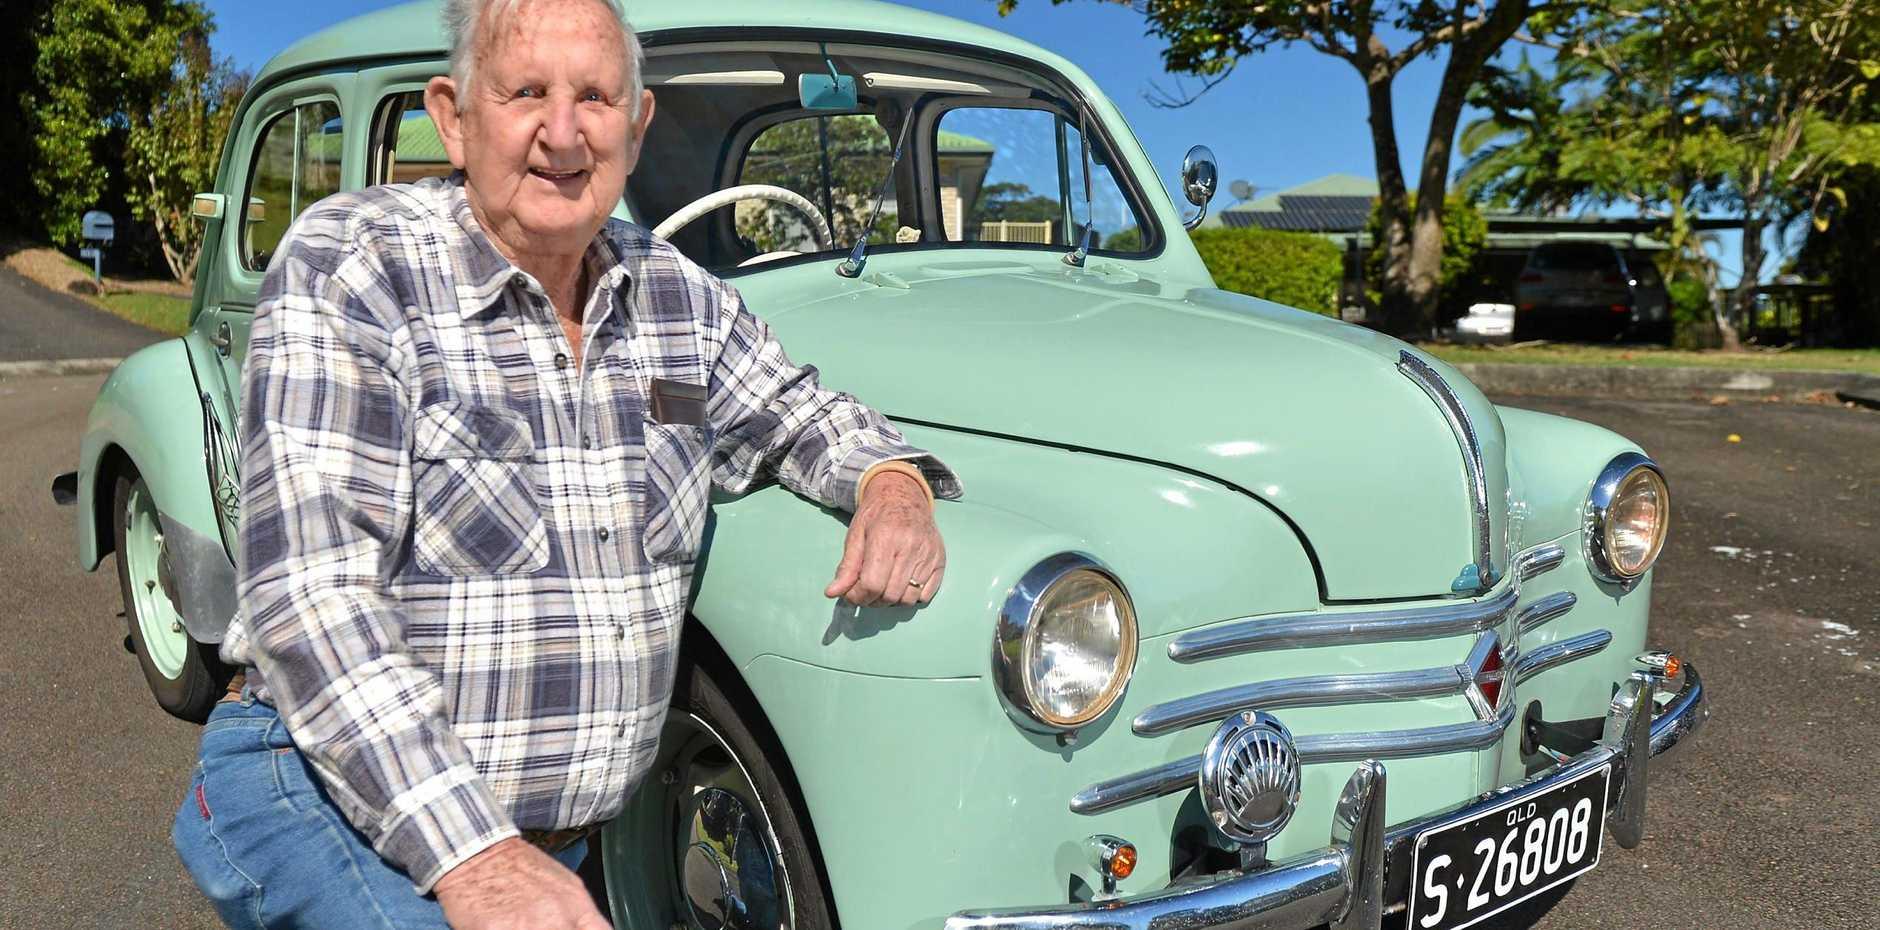 MY RIDE: Erroll Kerr with his 1956 Renault 750 4CV.